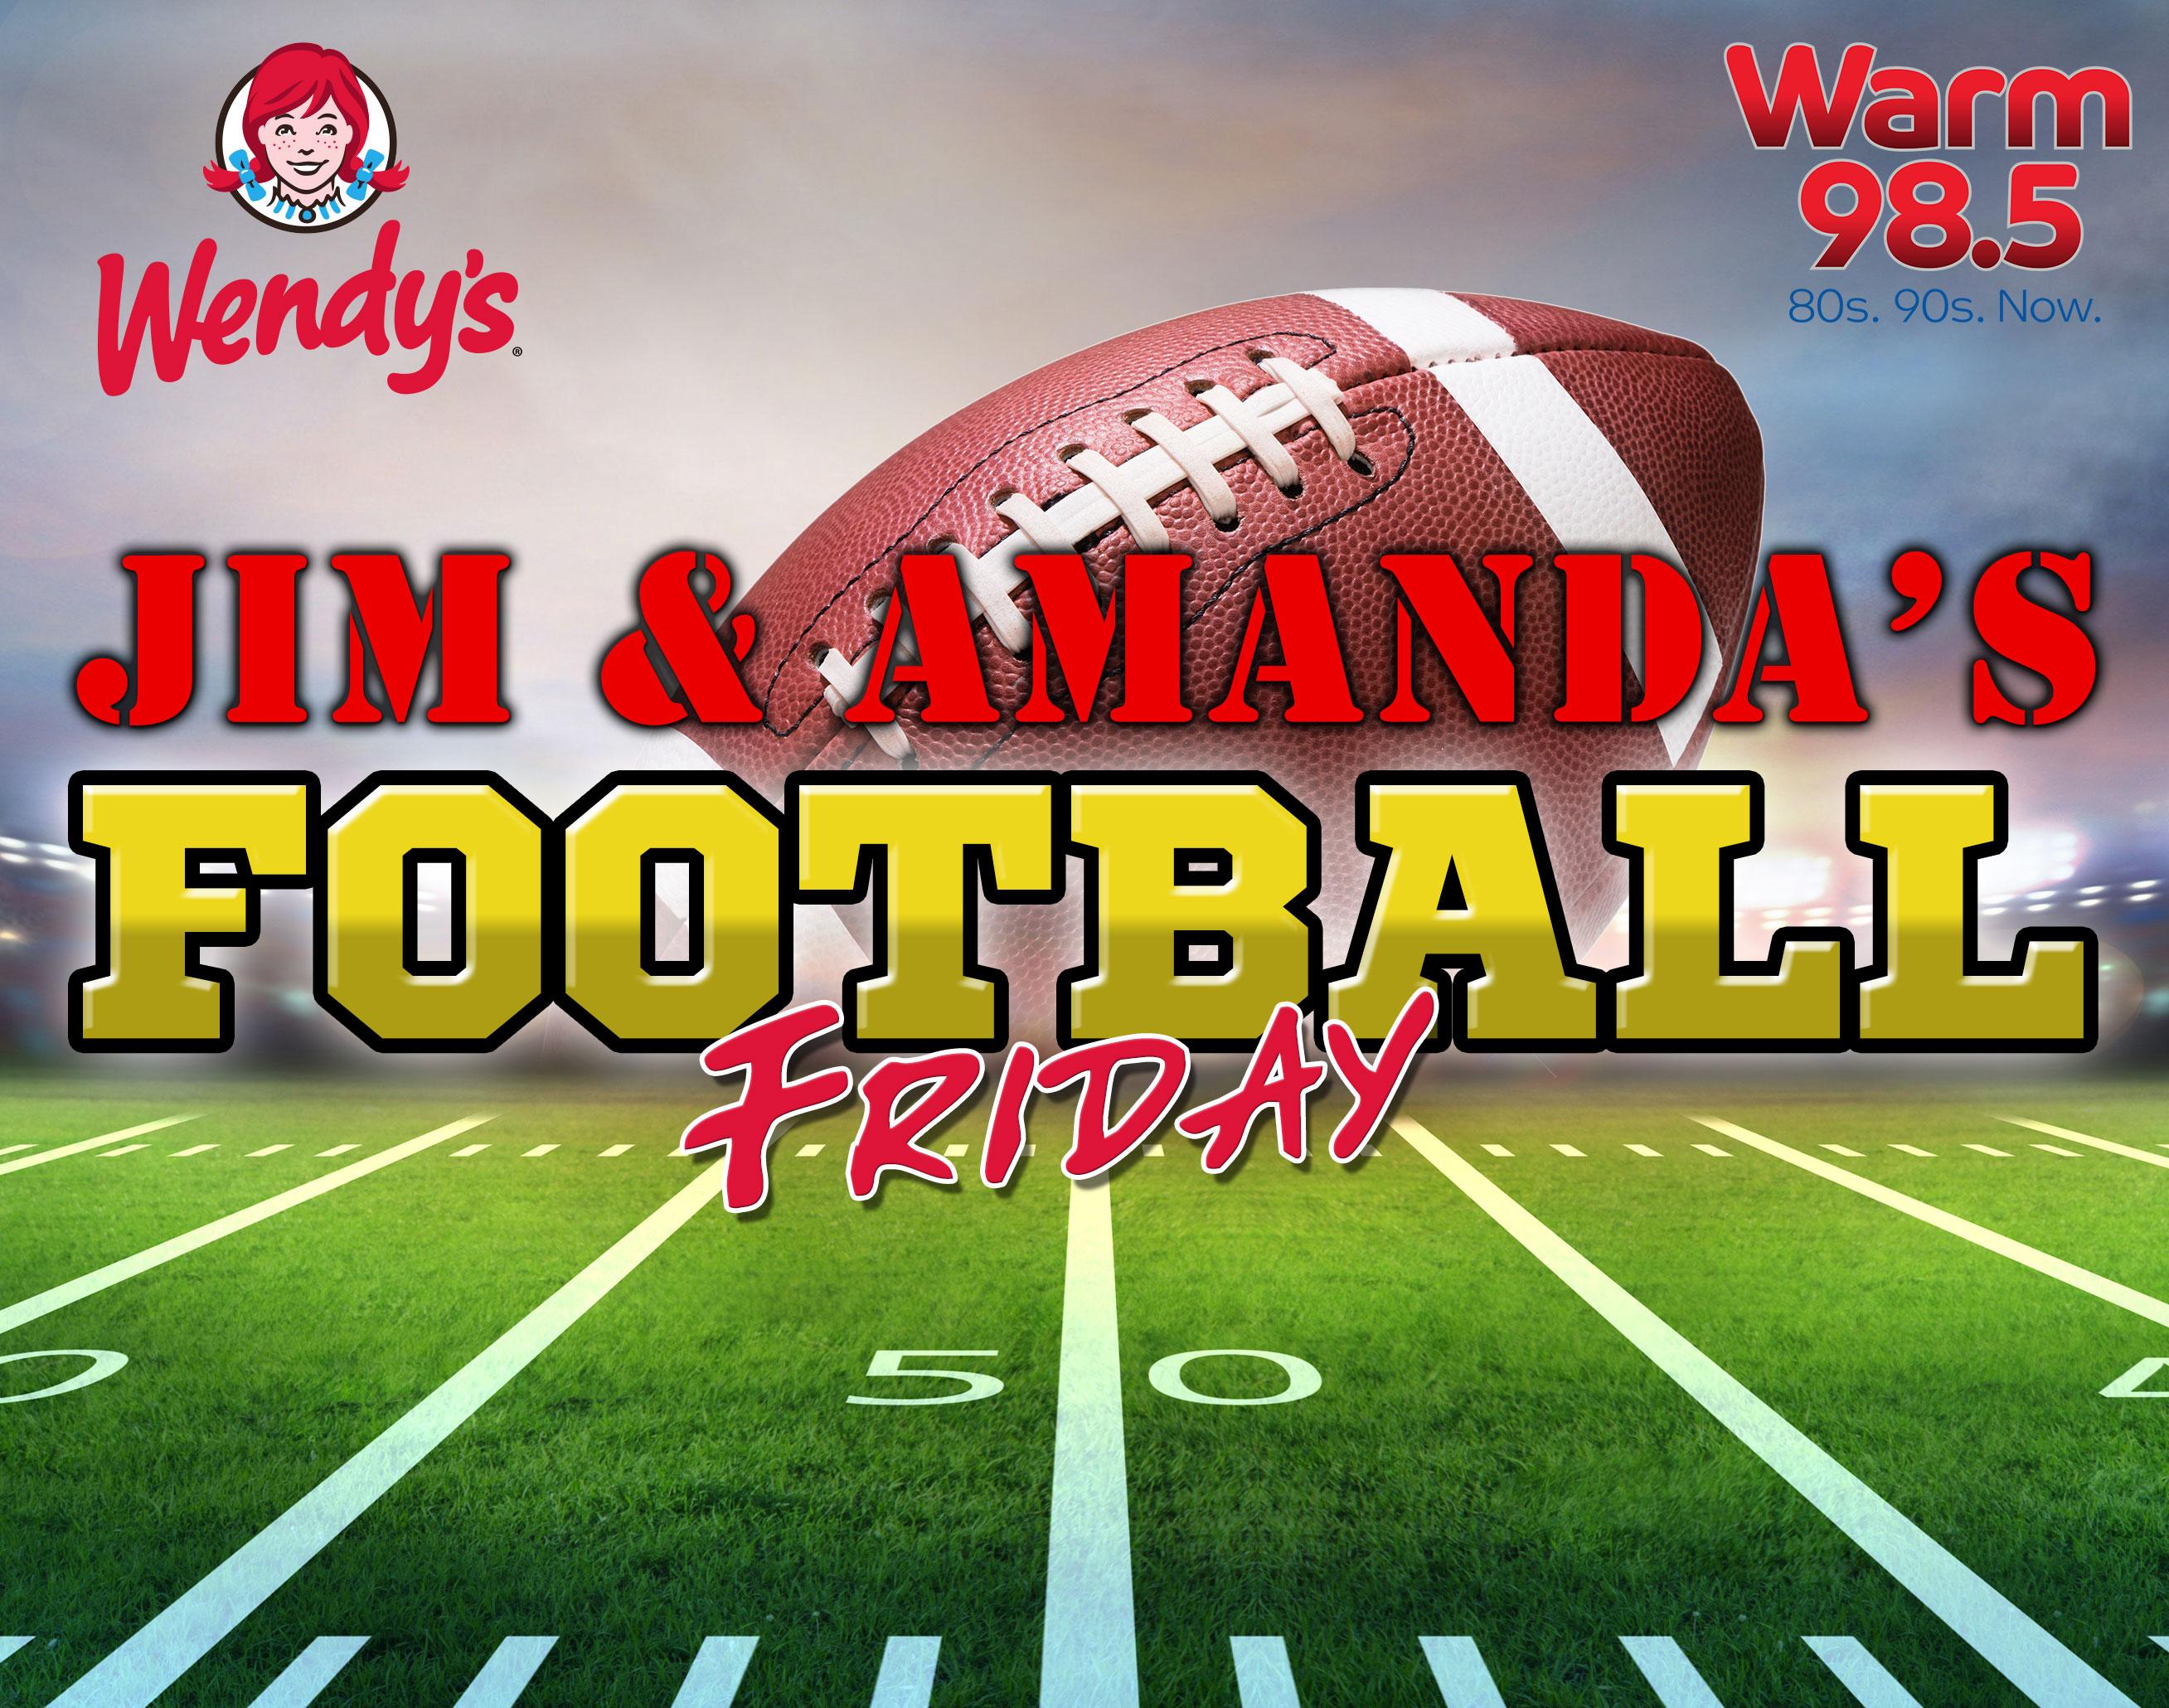 Jim and Amanda's Football Friday: Final Vote!